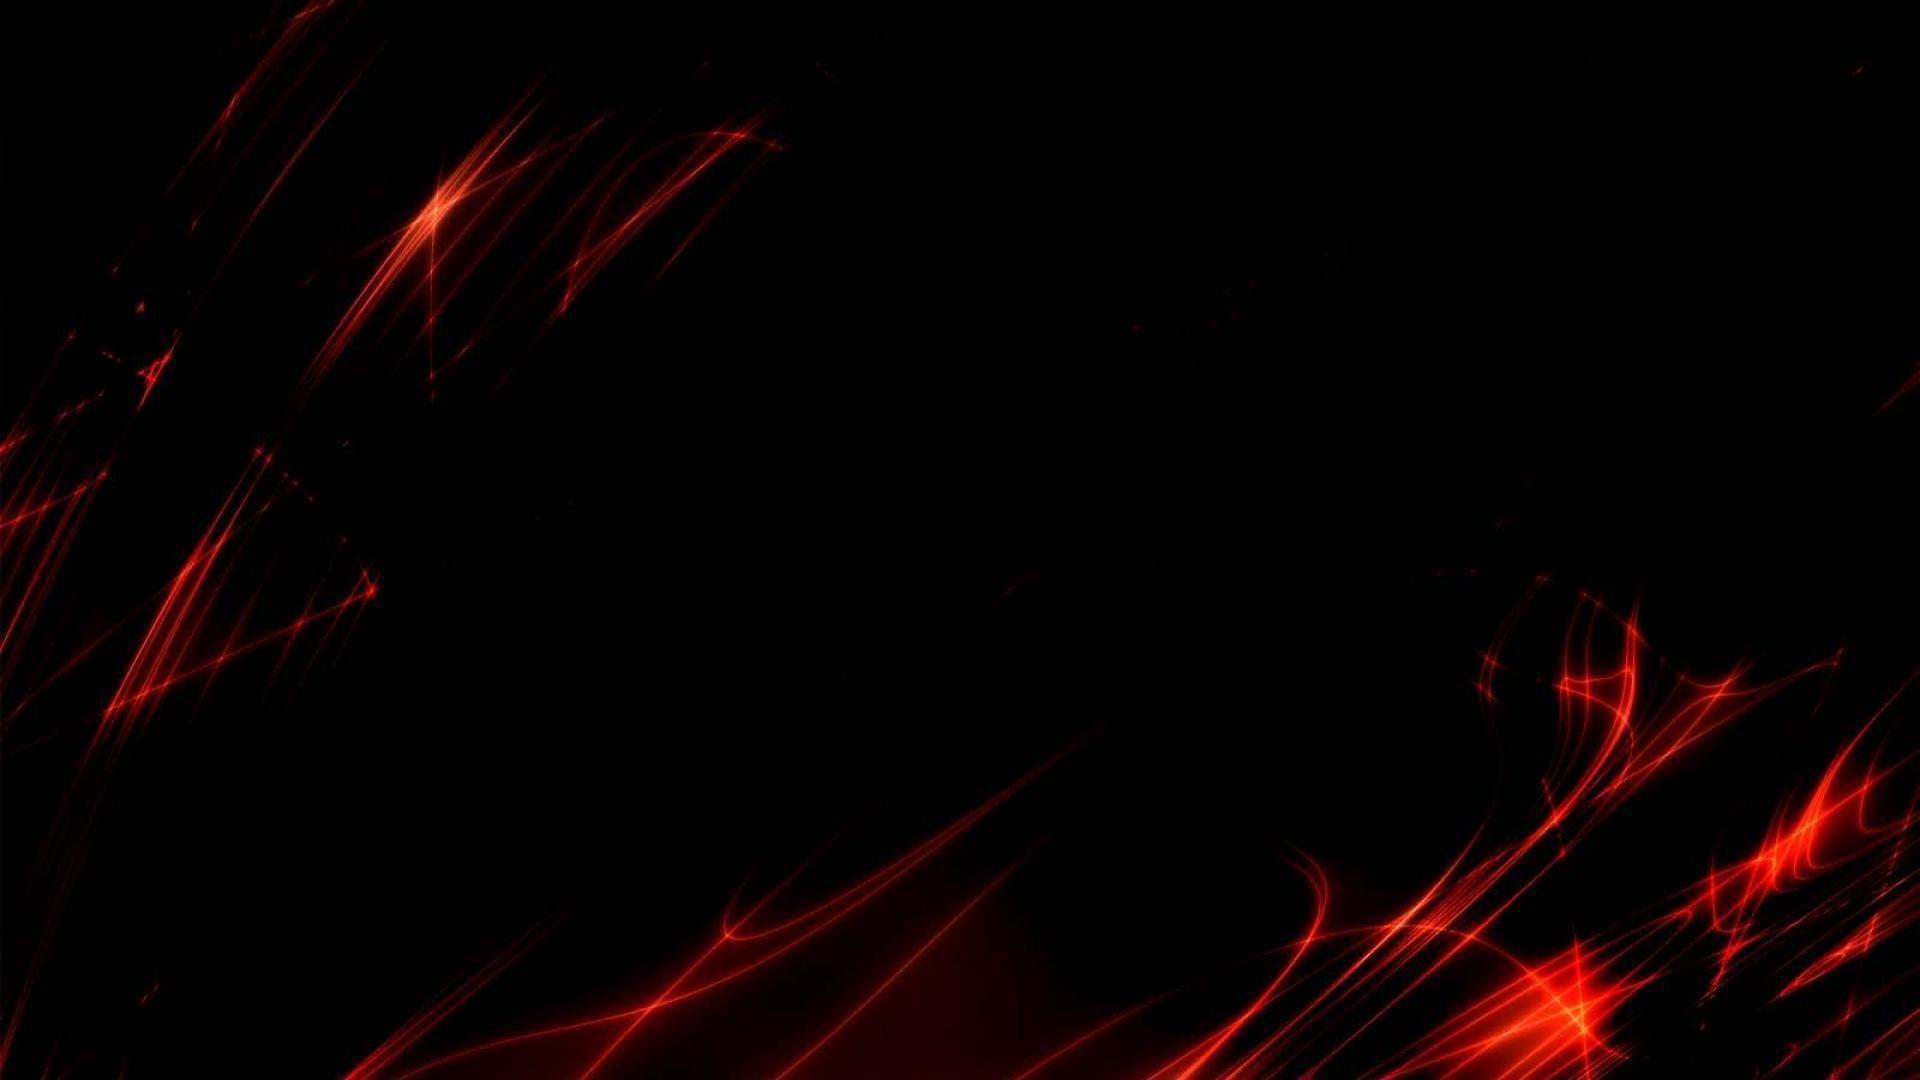 Download Dark Red Wallpaper Hd Backgrounds Download Itlcat